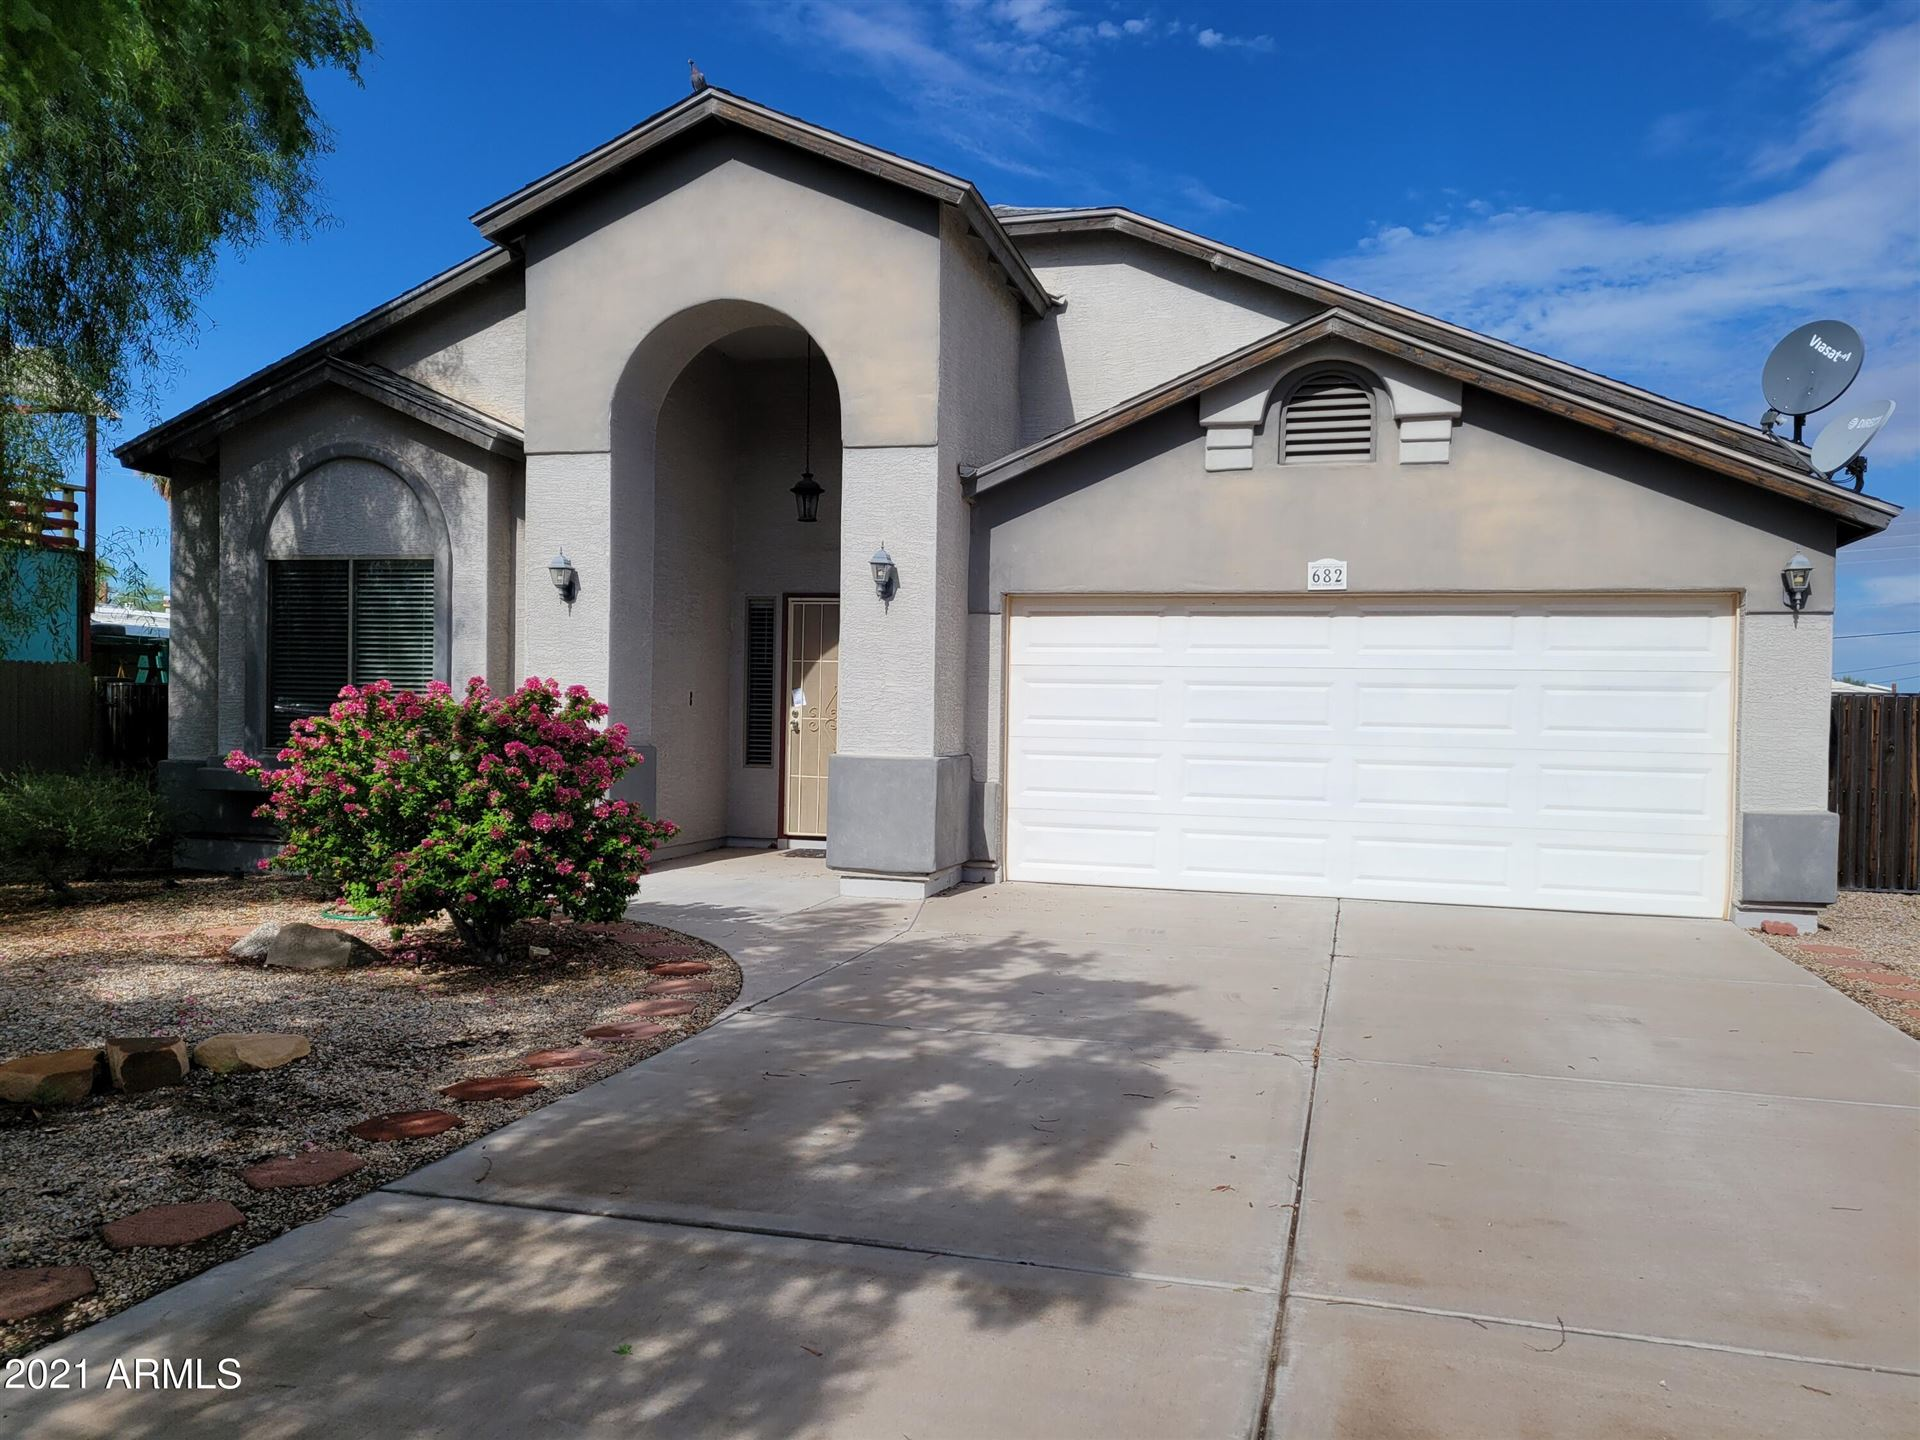 Photo of 682 S LAWSON Drive, Apache Junction, AZ 85120 (MLS # 6293003)